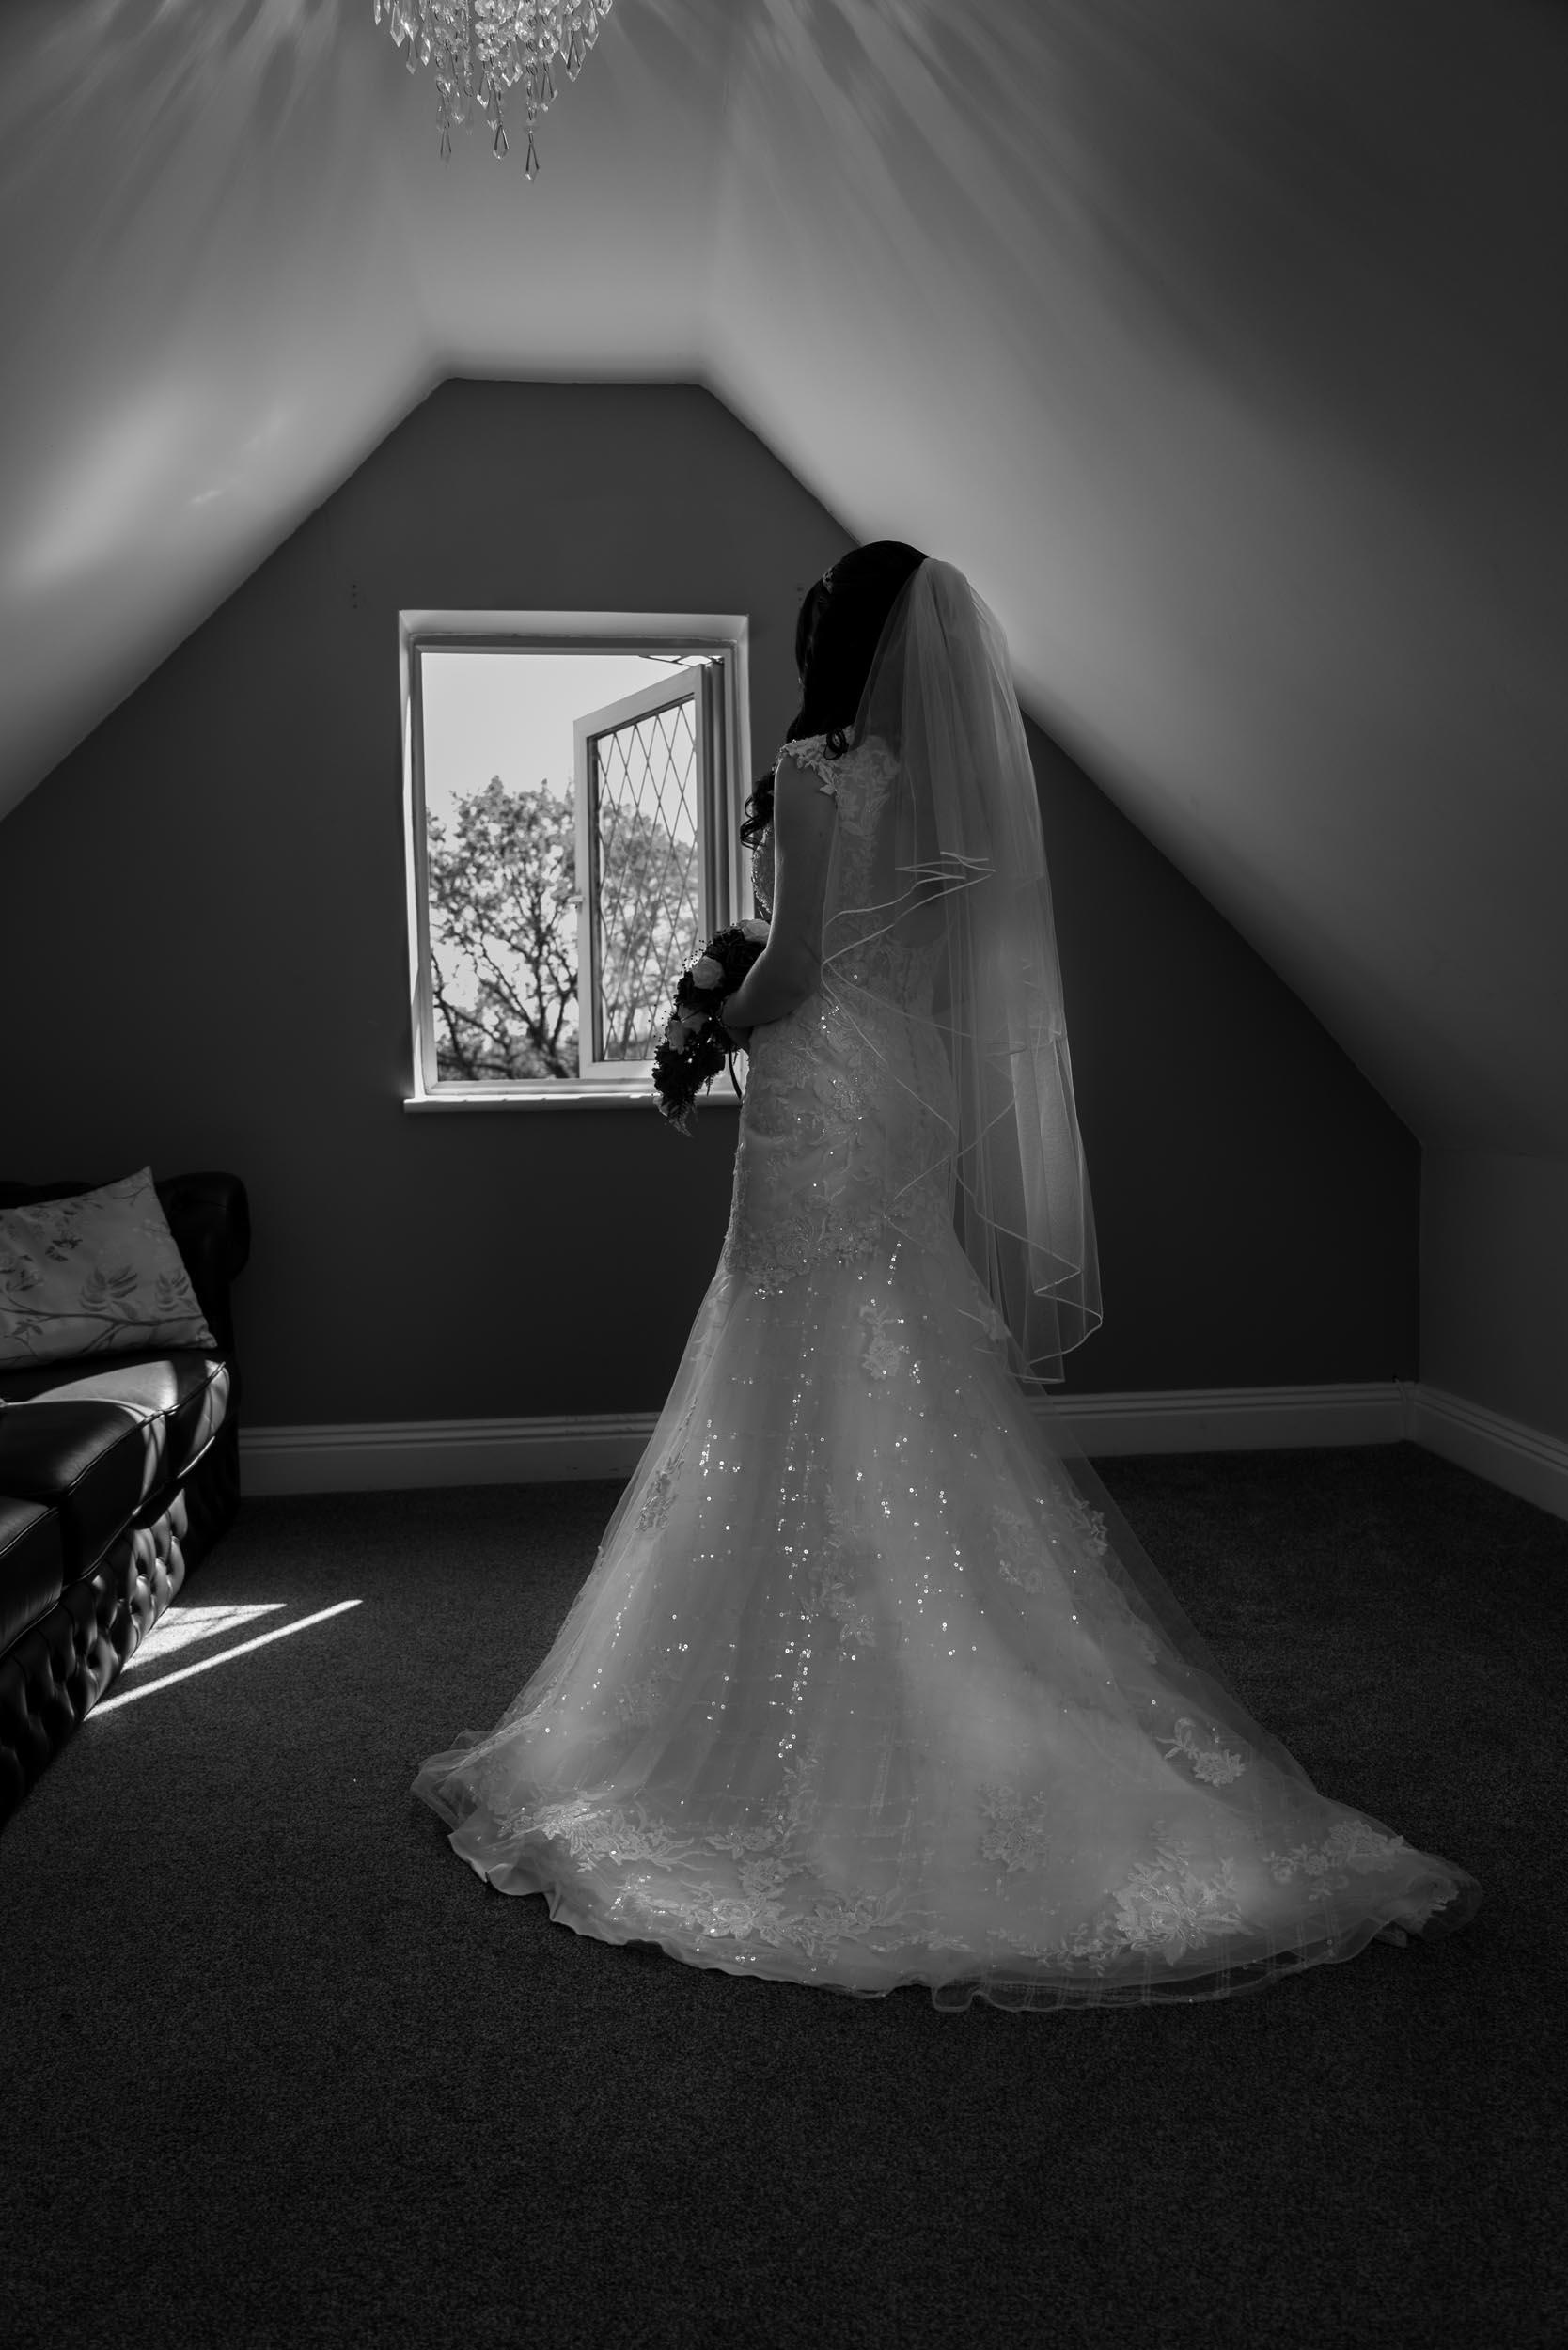 190420-Wedding-Preparations-The-Old-Rectory-362.jpg